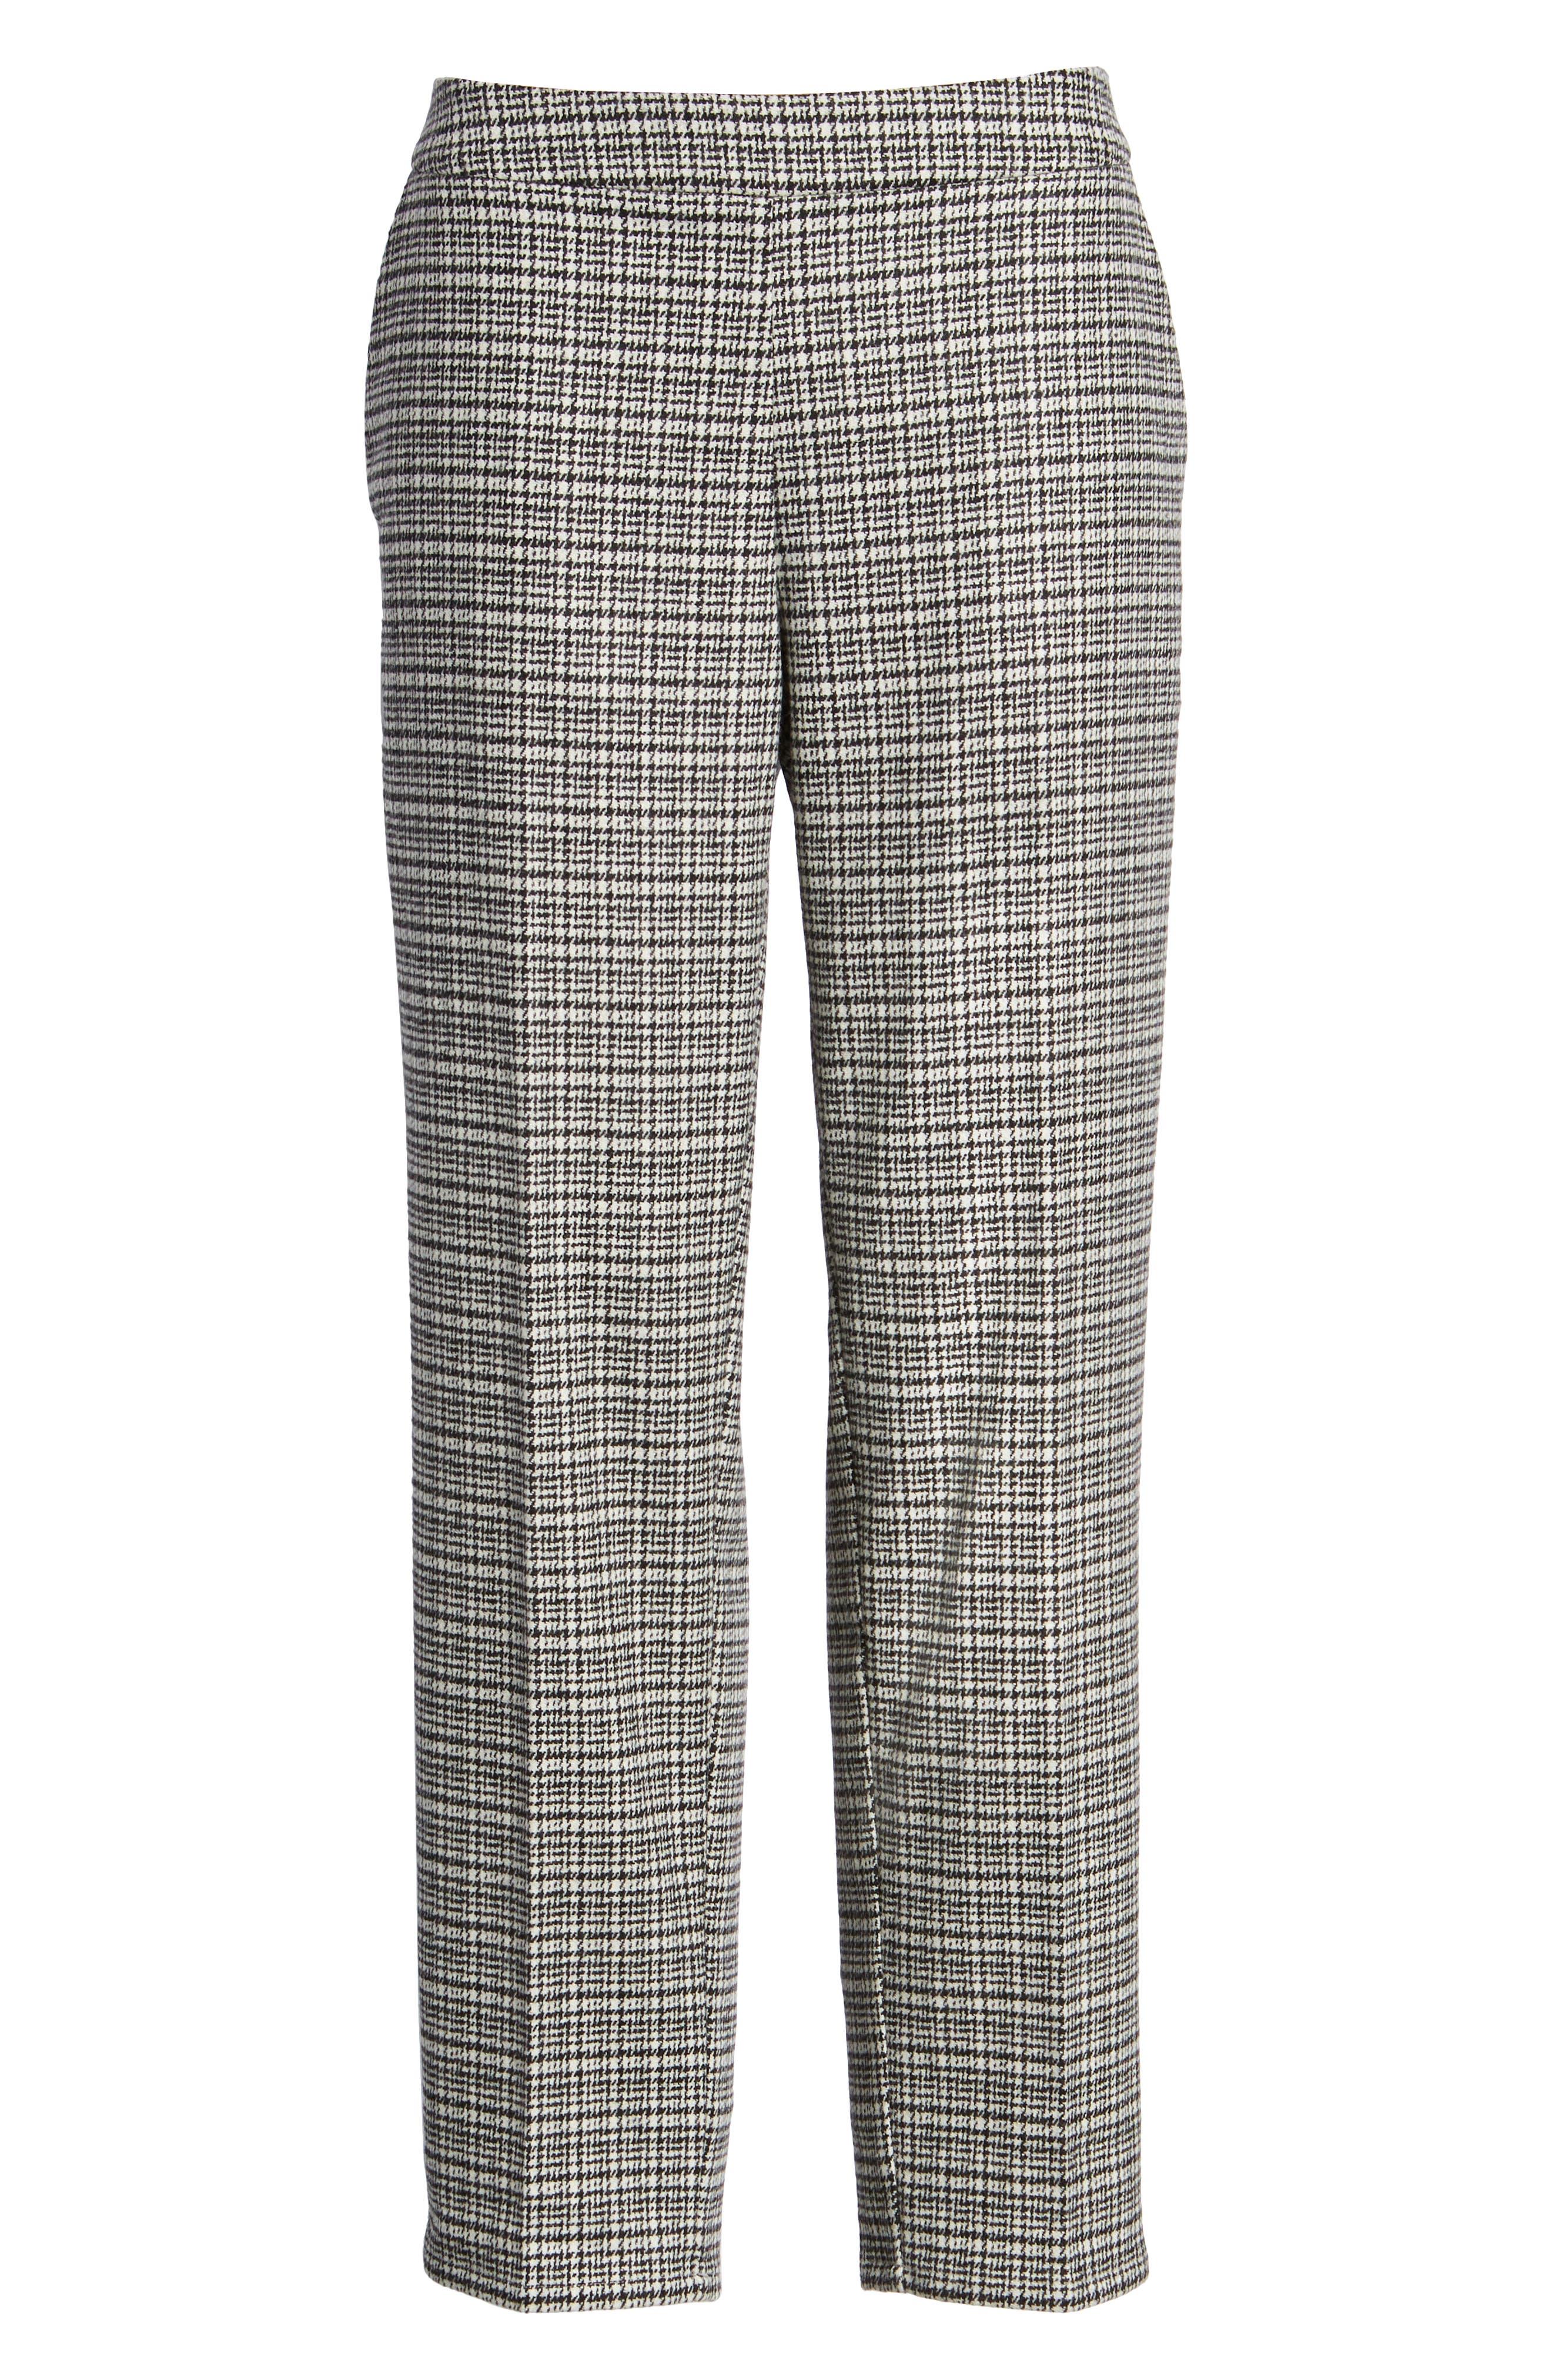 Slim Ankle Pants,                             Alternate thumbnail 6, color,                             018